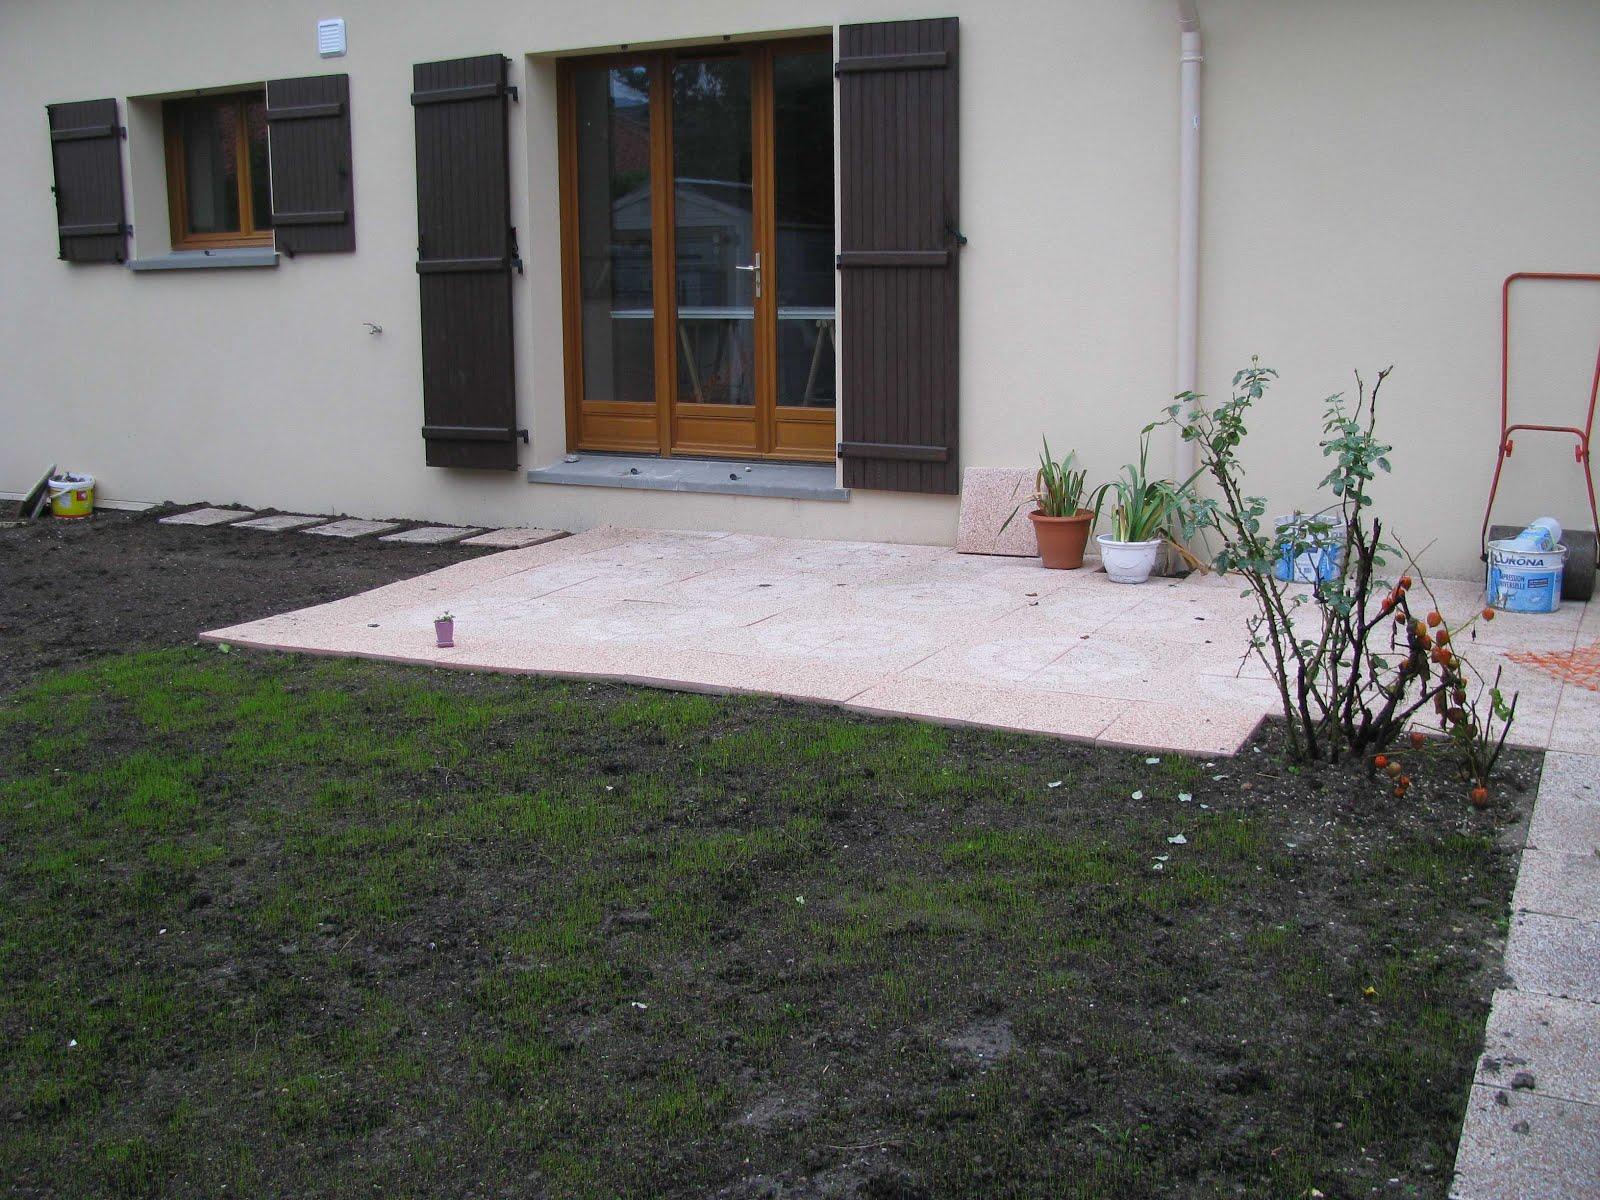 Je fais construire ma maison jardin 2 2 for Construire ma maison